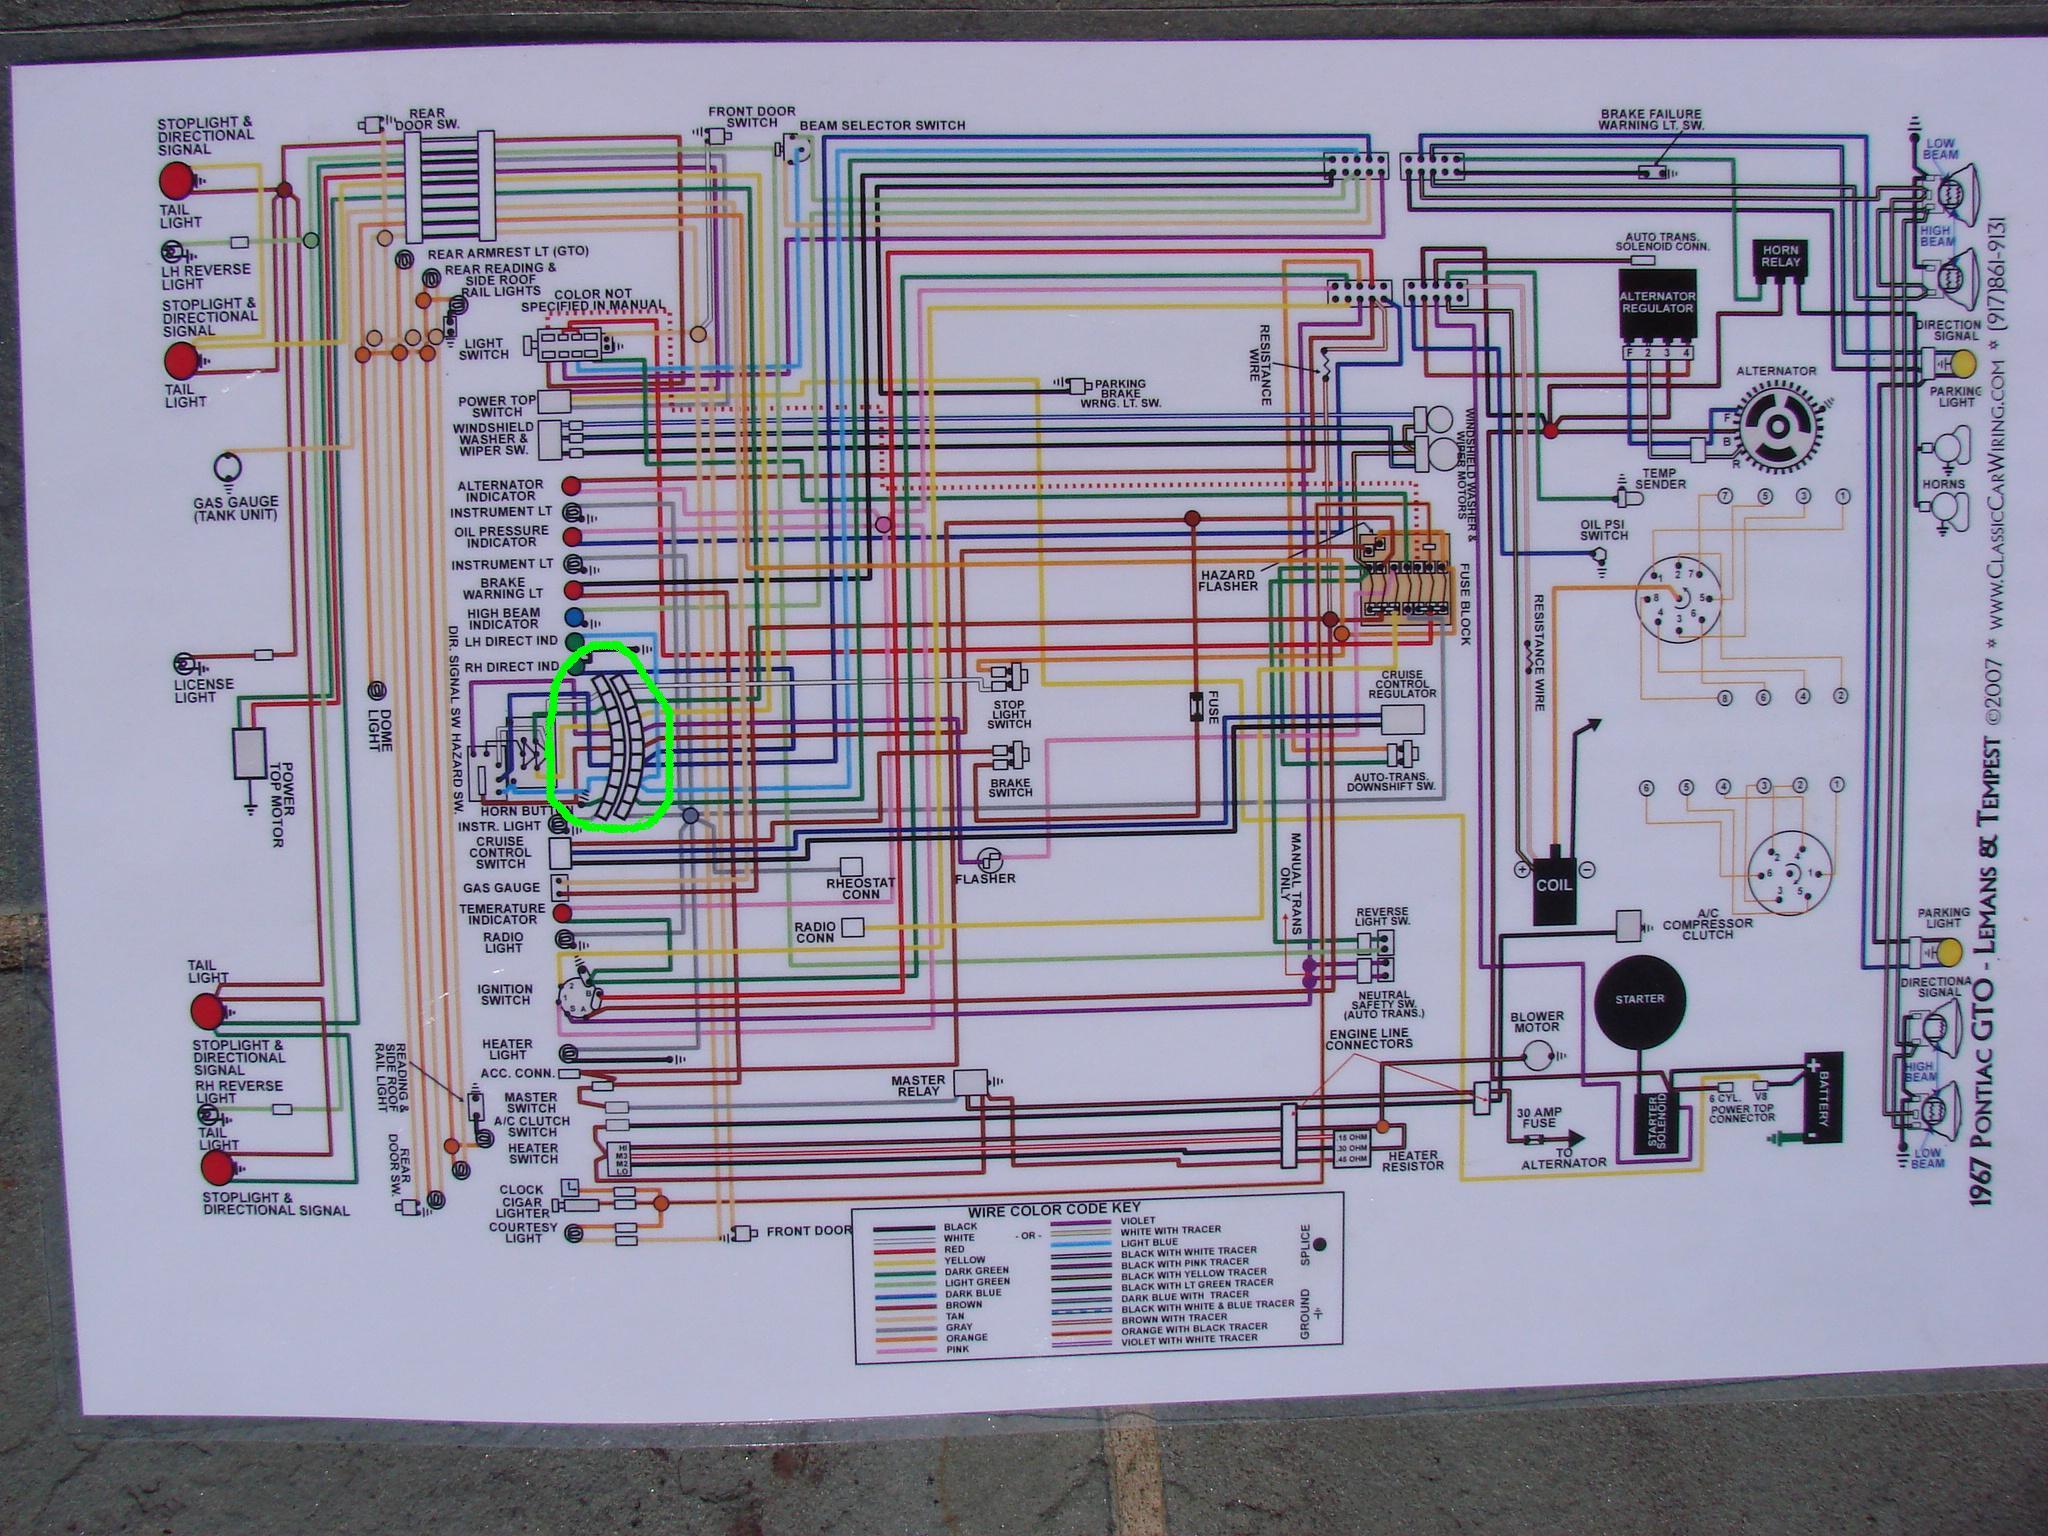 chevy truck c wiring diagram image 64 chevy c10 wiring diagram 65 truck 64 auto wiring diagram on 1964 chevy truck c10